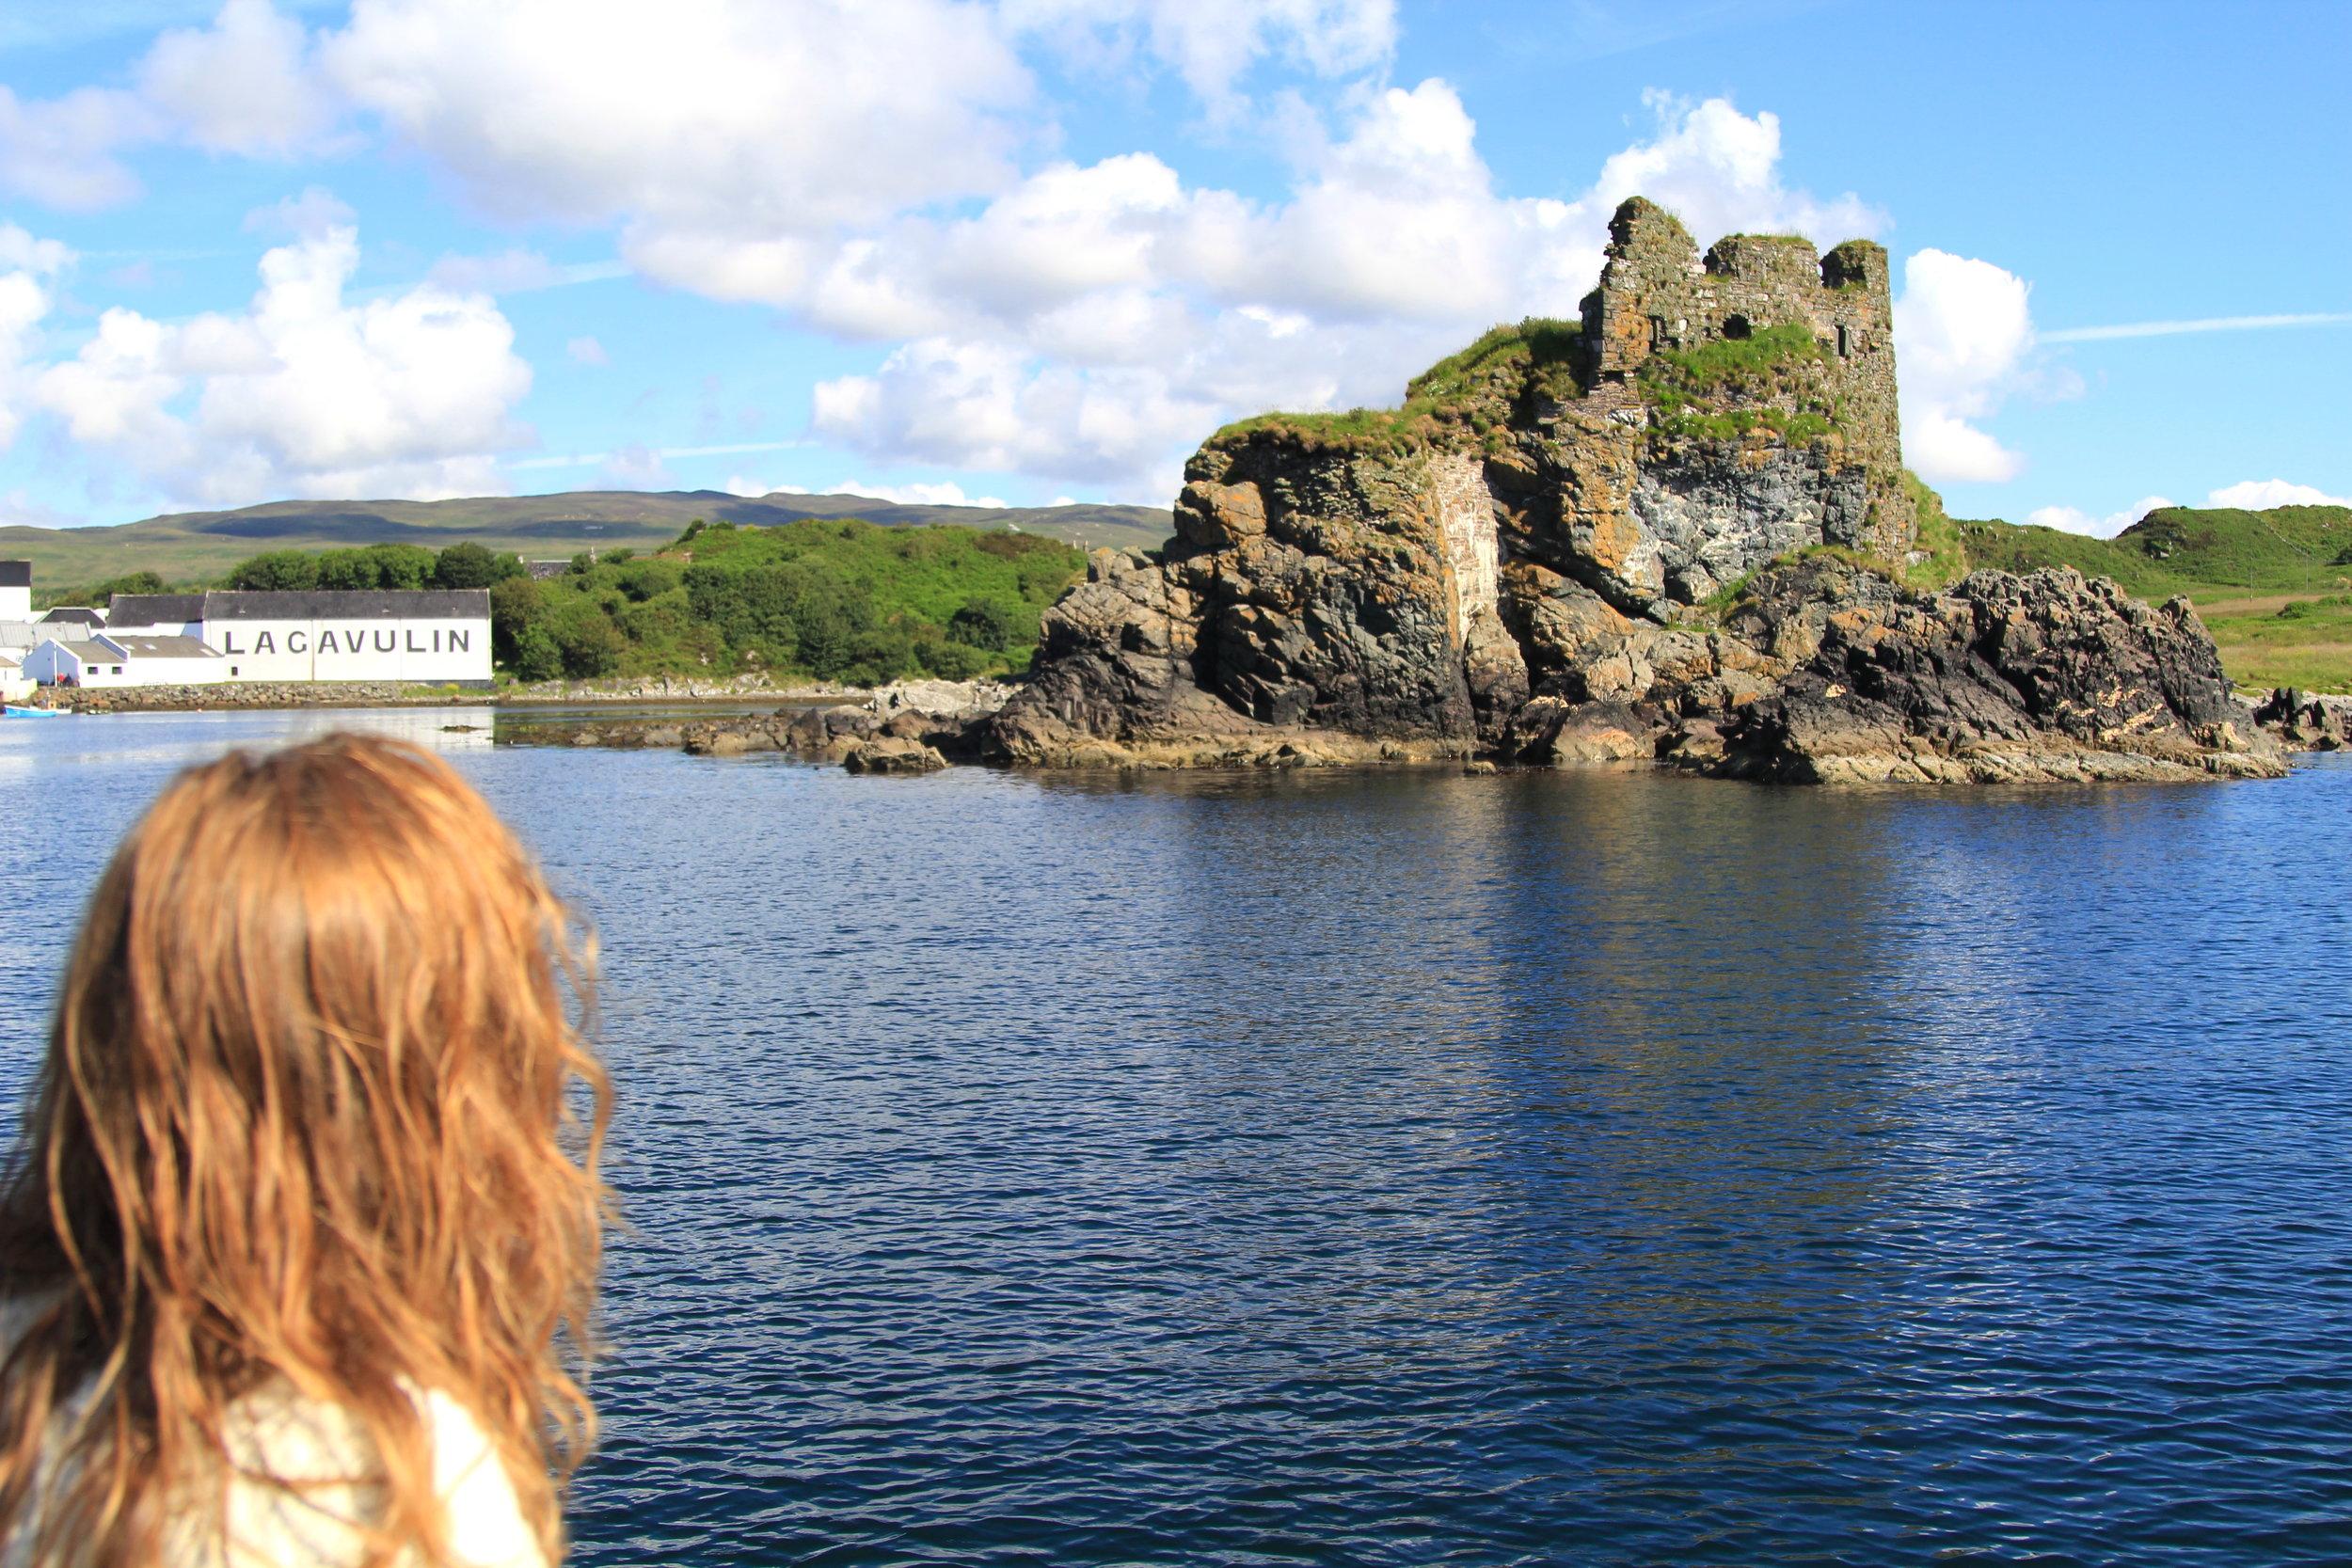 Dunyvaig Castle, Islay, Scotland